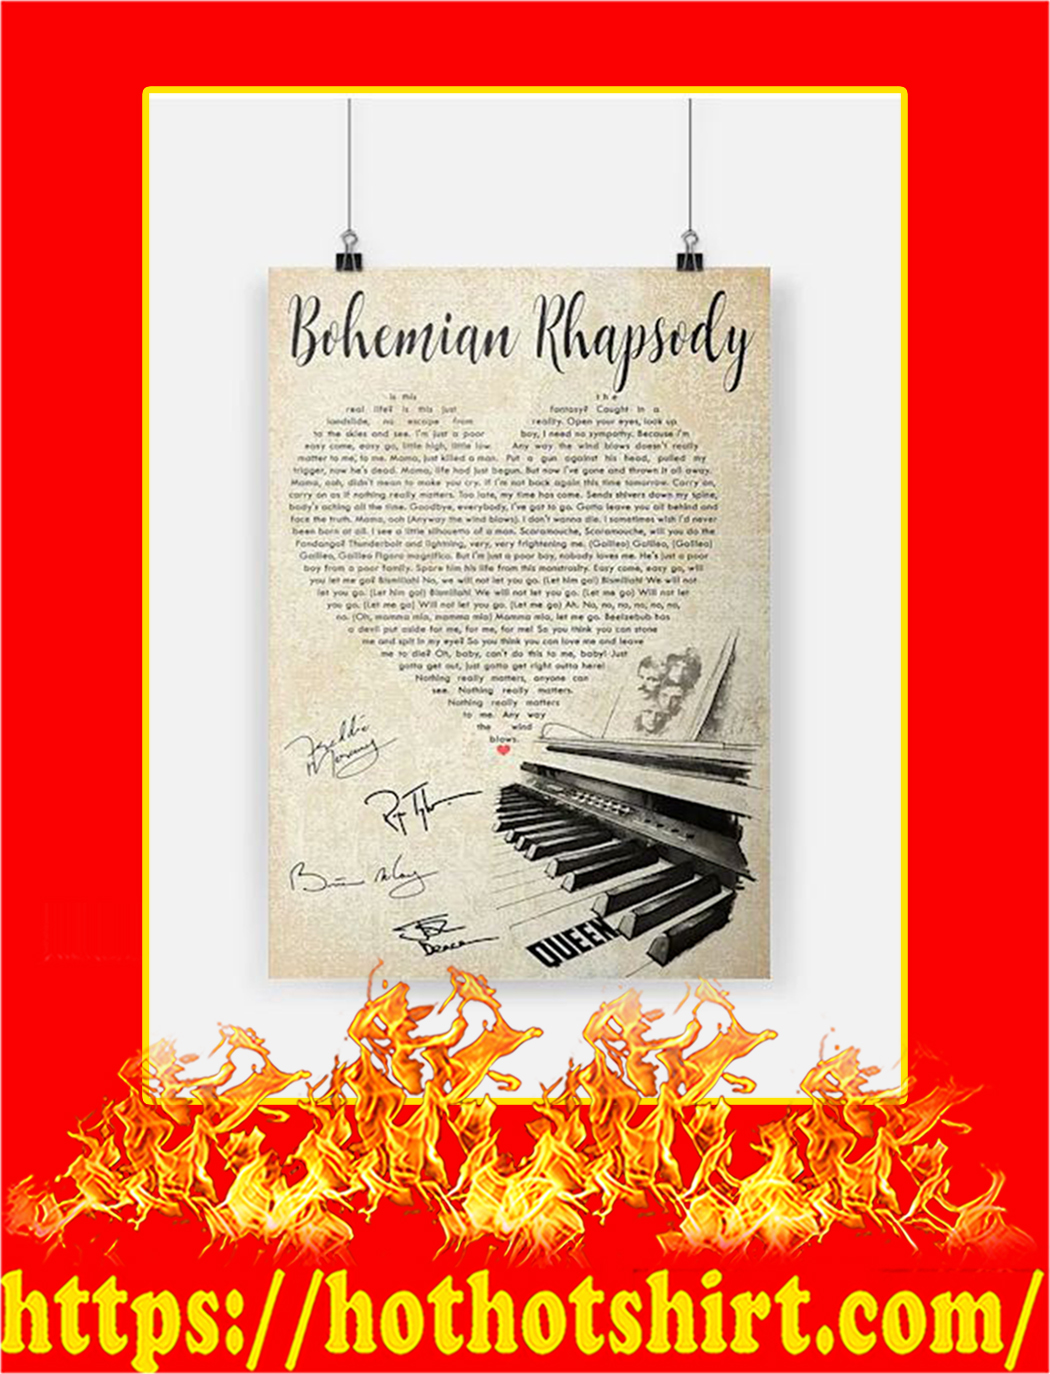 Bohemian Rhapsody Queen Heart Poster - A2